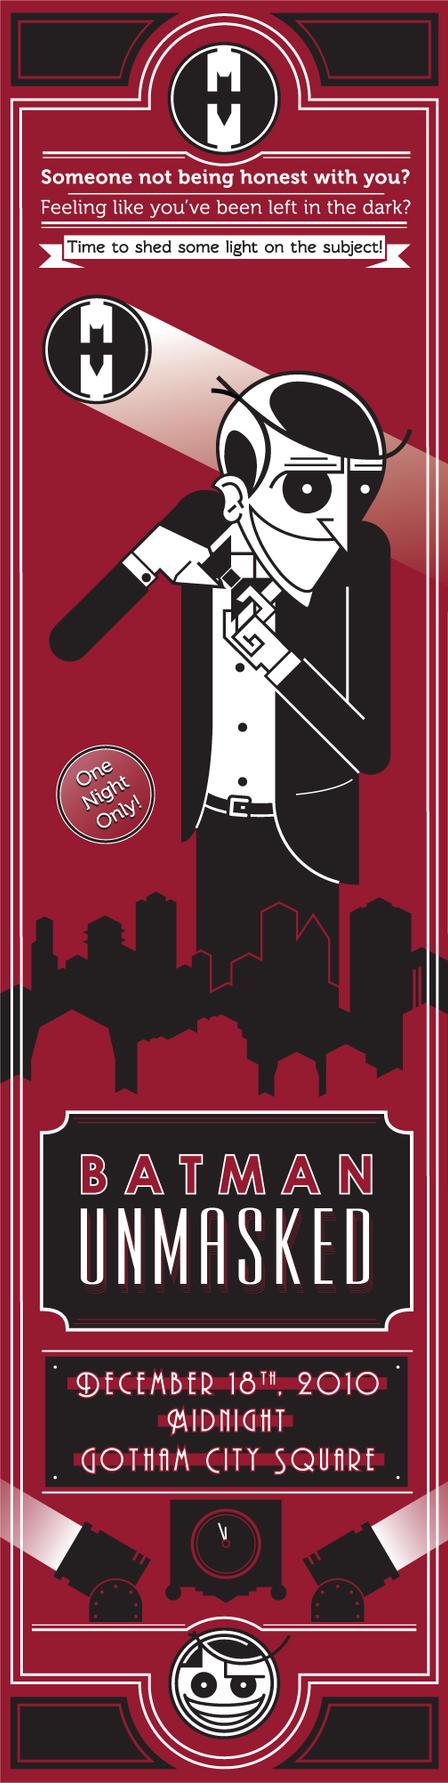 Batman Unmasked Joker Poster by BombtasticDynamo